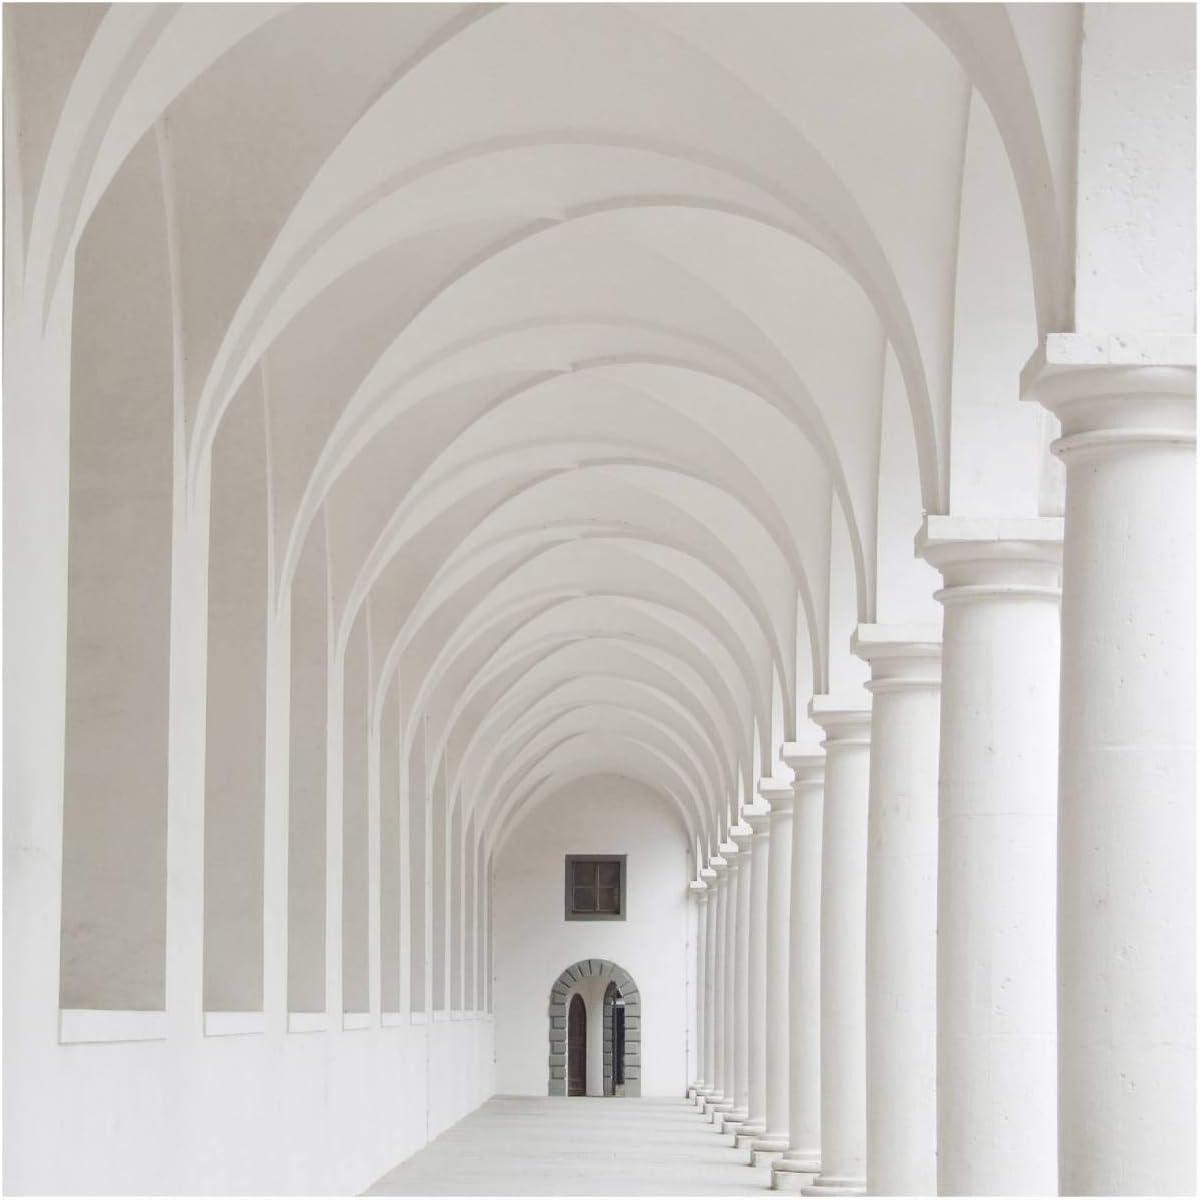 Bilderwelten Fotomural Dimensi/ón Alto x Ancho: 192cm x 192cm Arcades Mural cuadrado papel pintado fotomurales murales pared papel para pared foto 3D mural pared barato decorativo